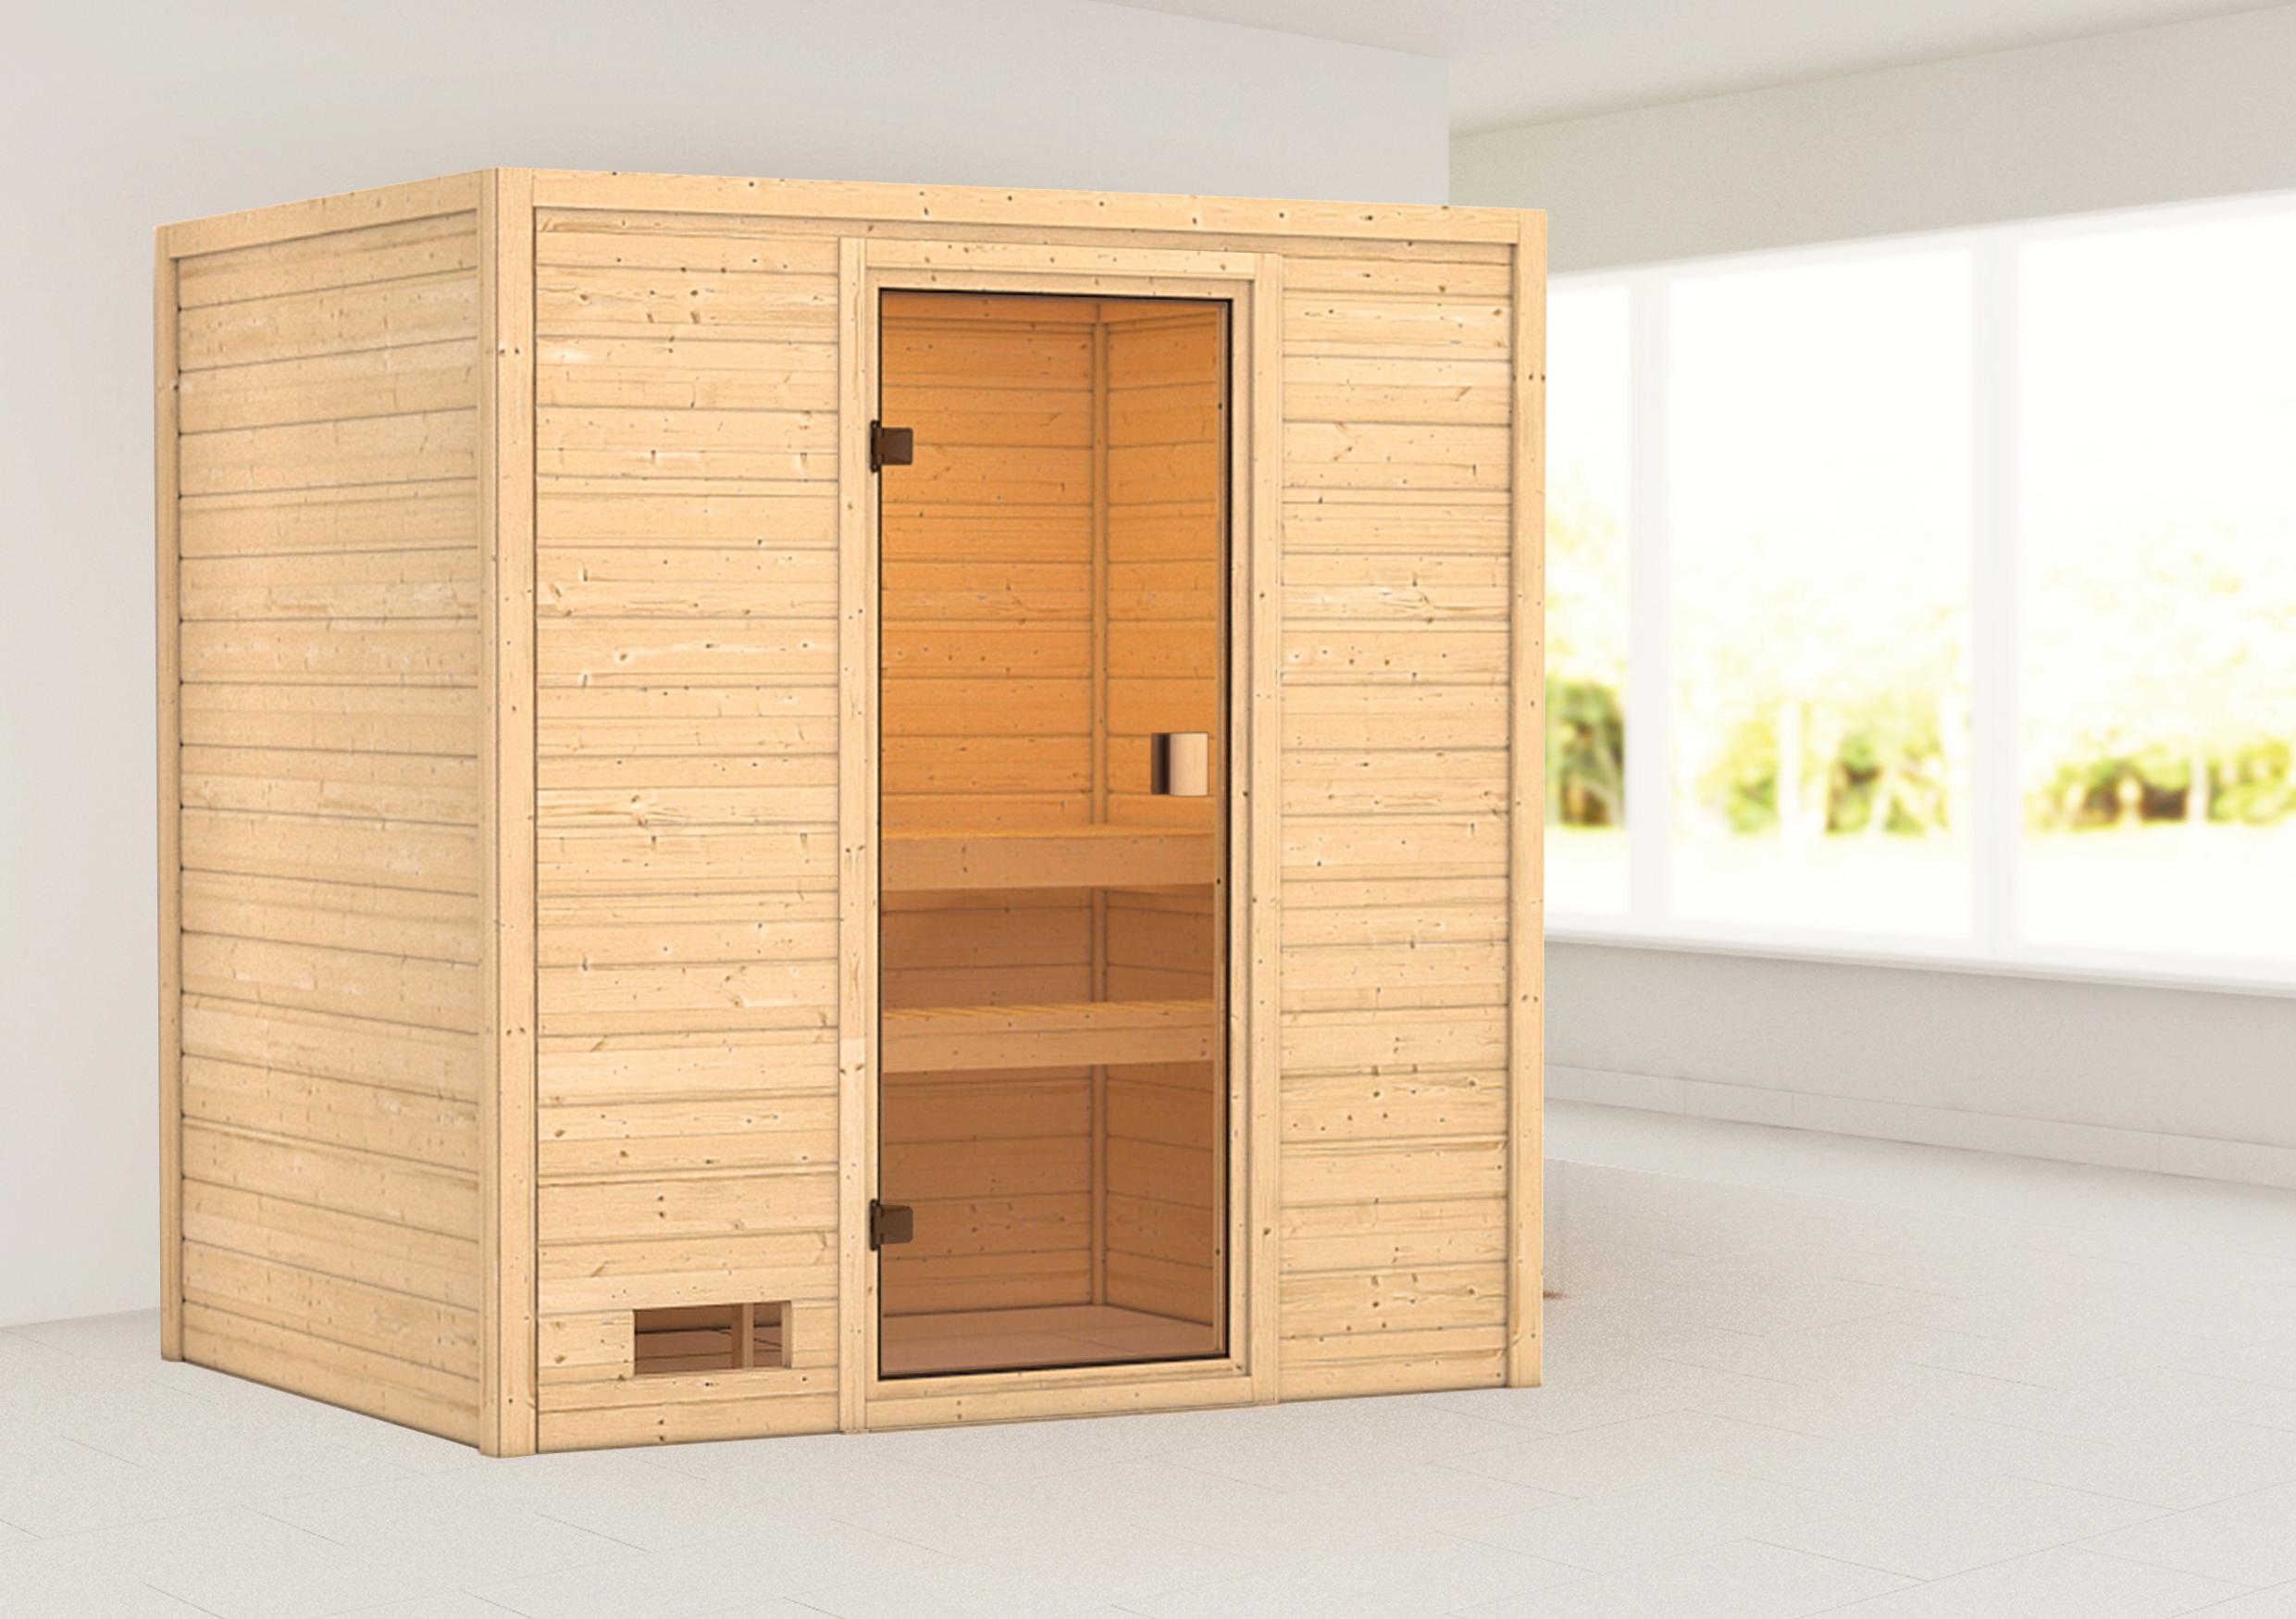 Woodfeeling Sauna Selena 38mm ohne Saunaofen Bild 1